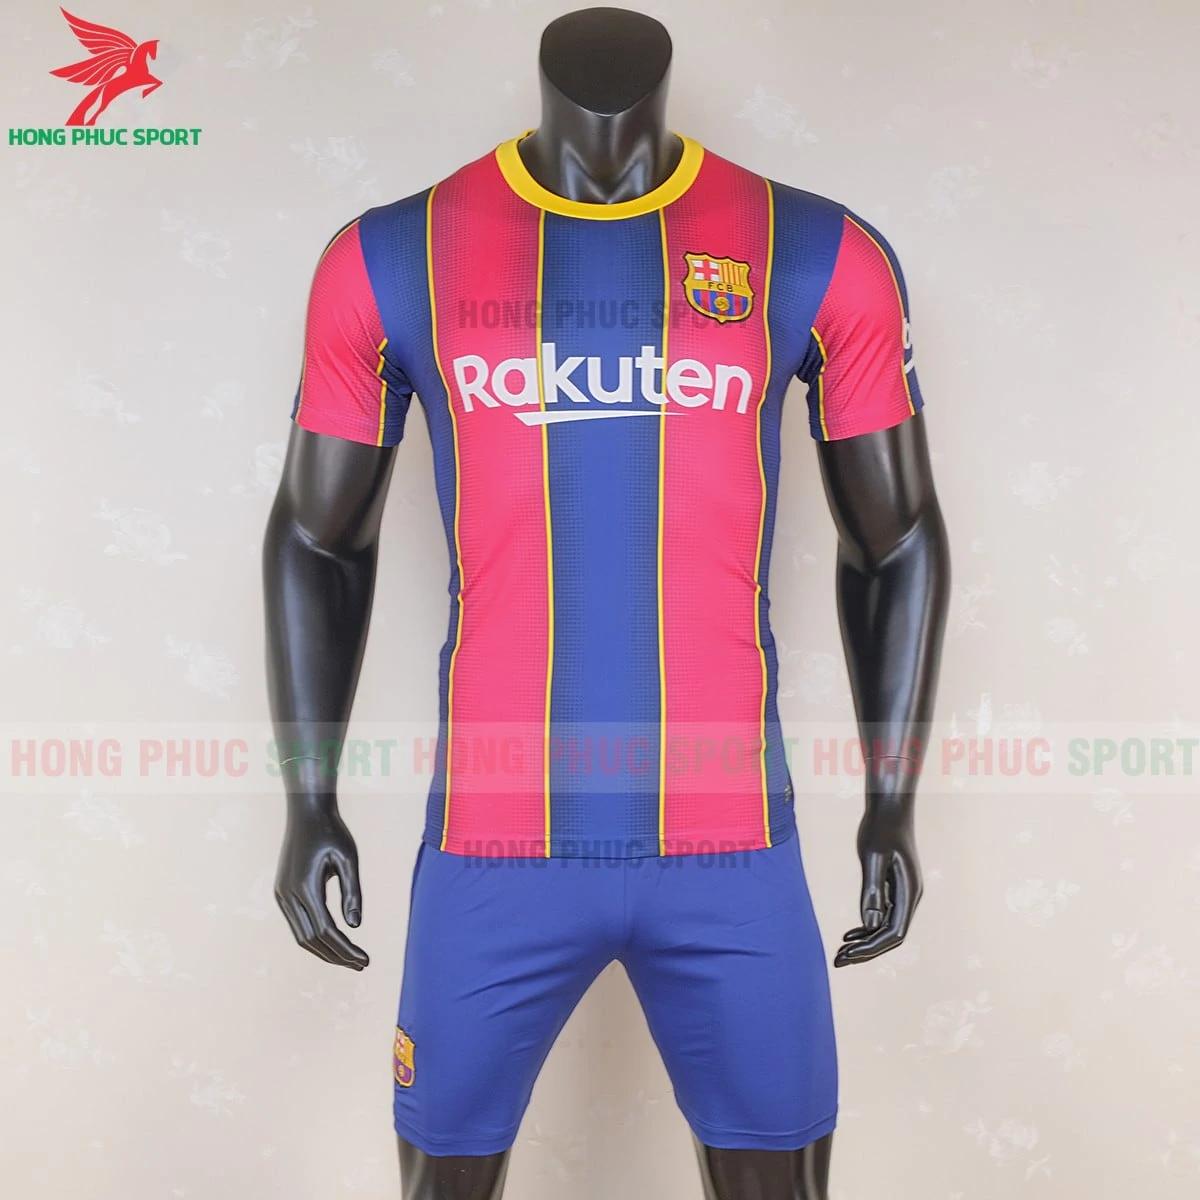 https://cdn.hongphucsport.com/unsafe/s4.shopbay.vn/files/285/ao-barcelona-2020-san-nha-hang-thailand-2-5f7305b814ddd.png